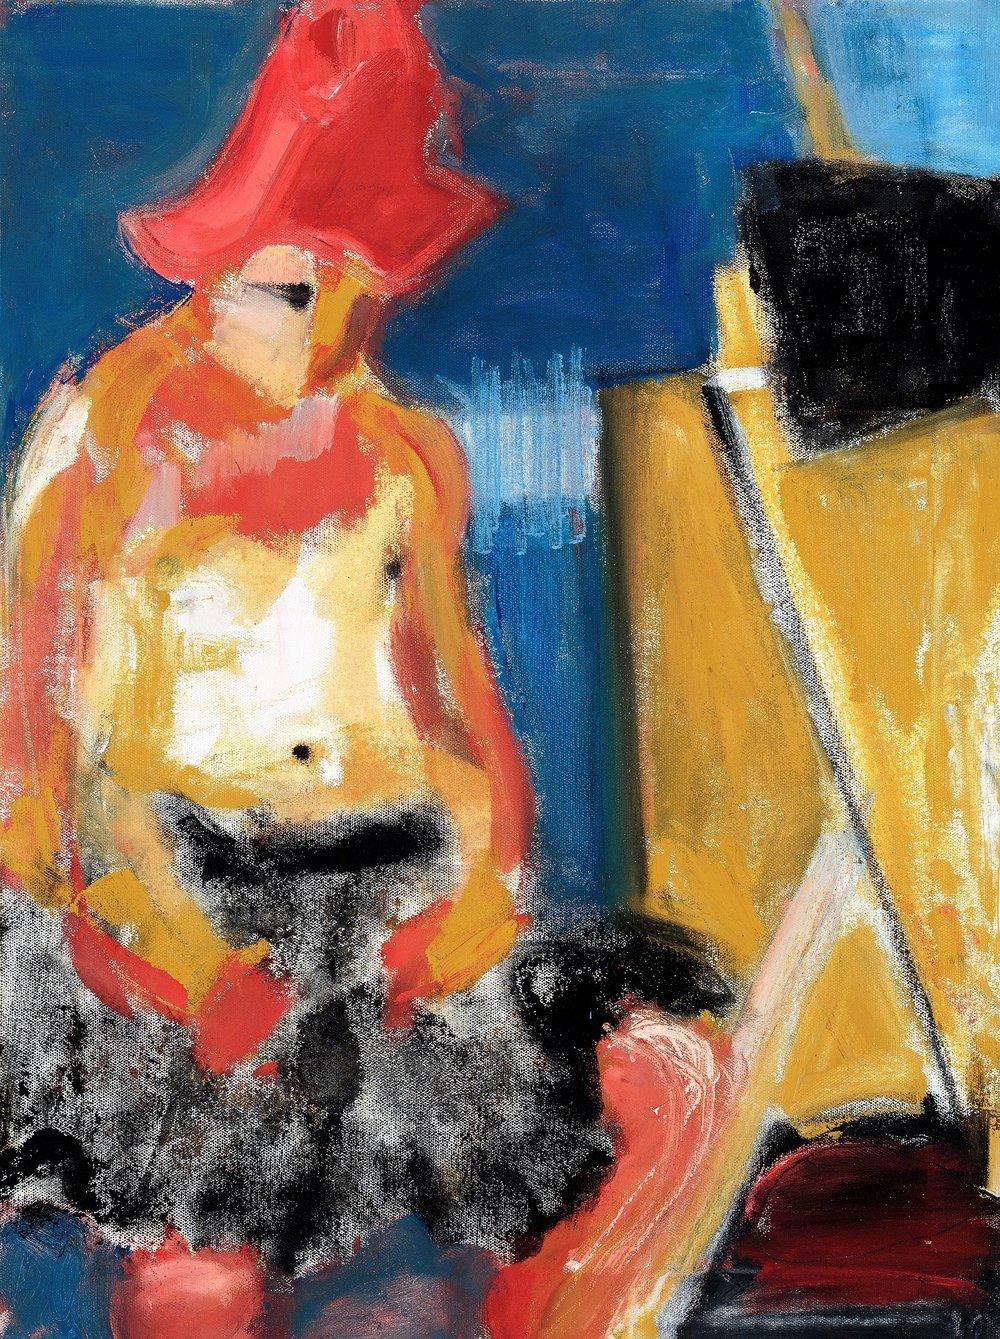 "#1, 2016, Oil on Canvas, 24 x 18"""